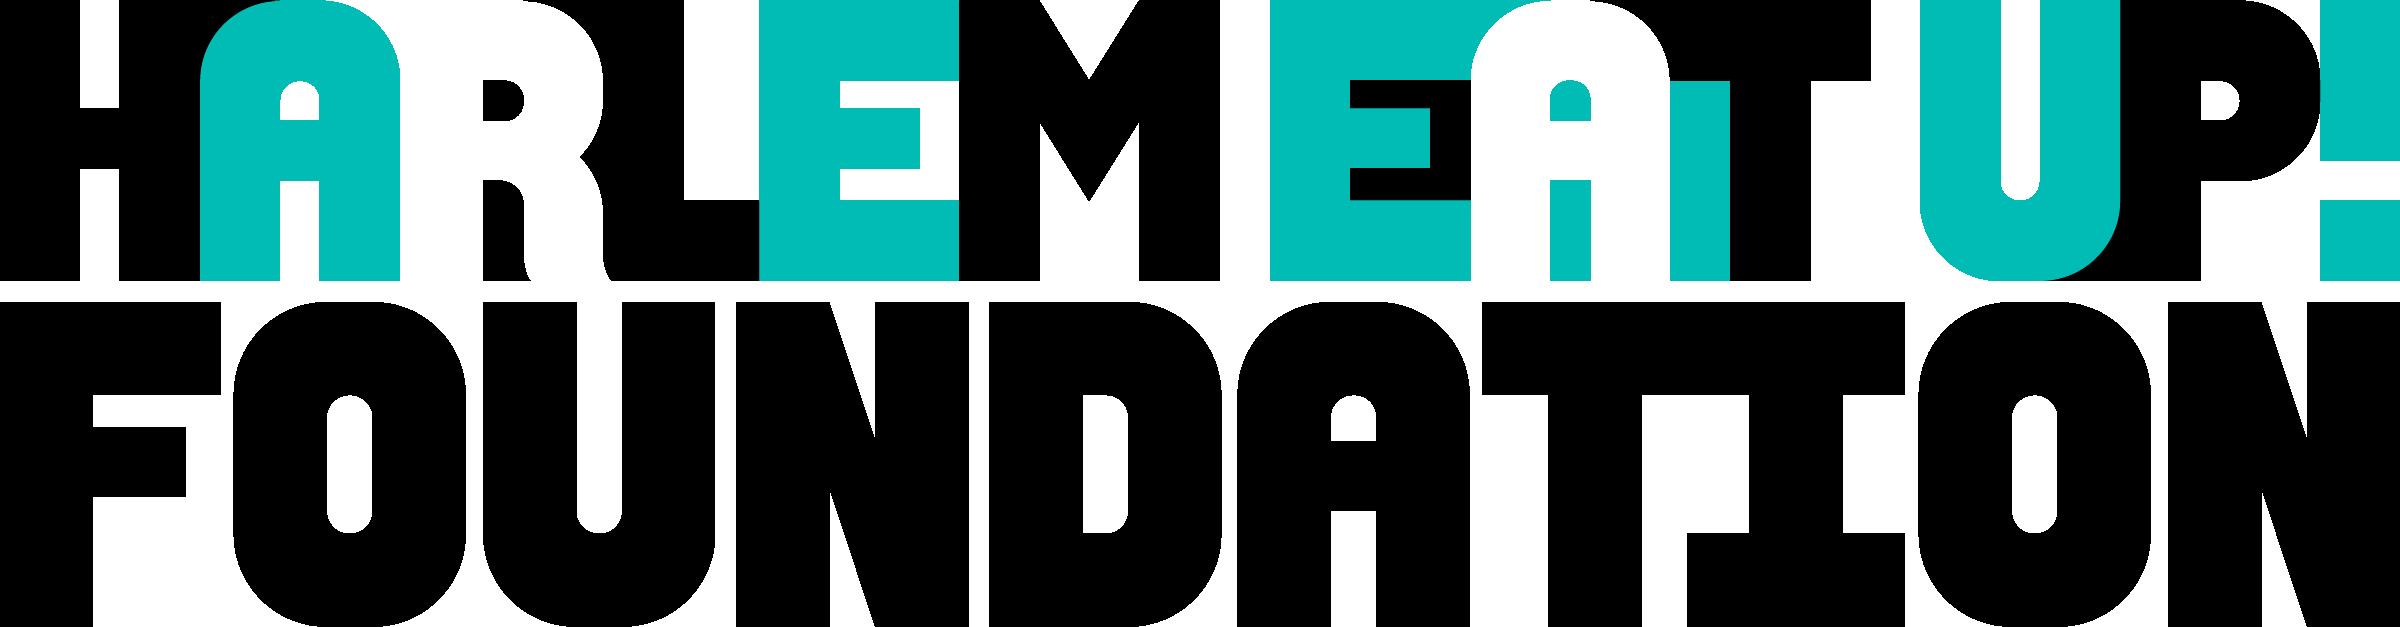 Harlem EatUp! : Harlem EatUp! Foundation